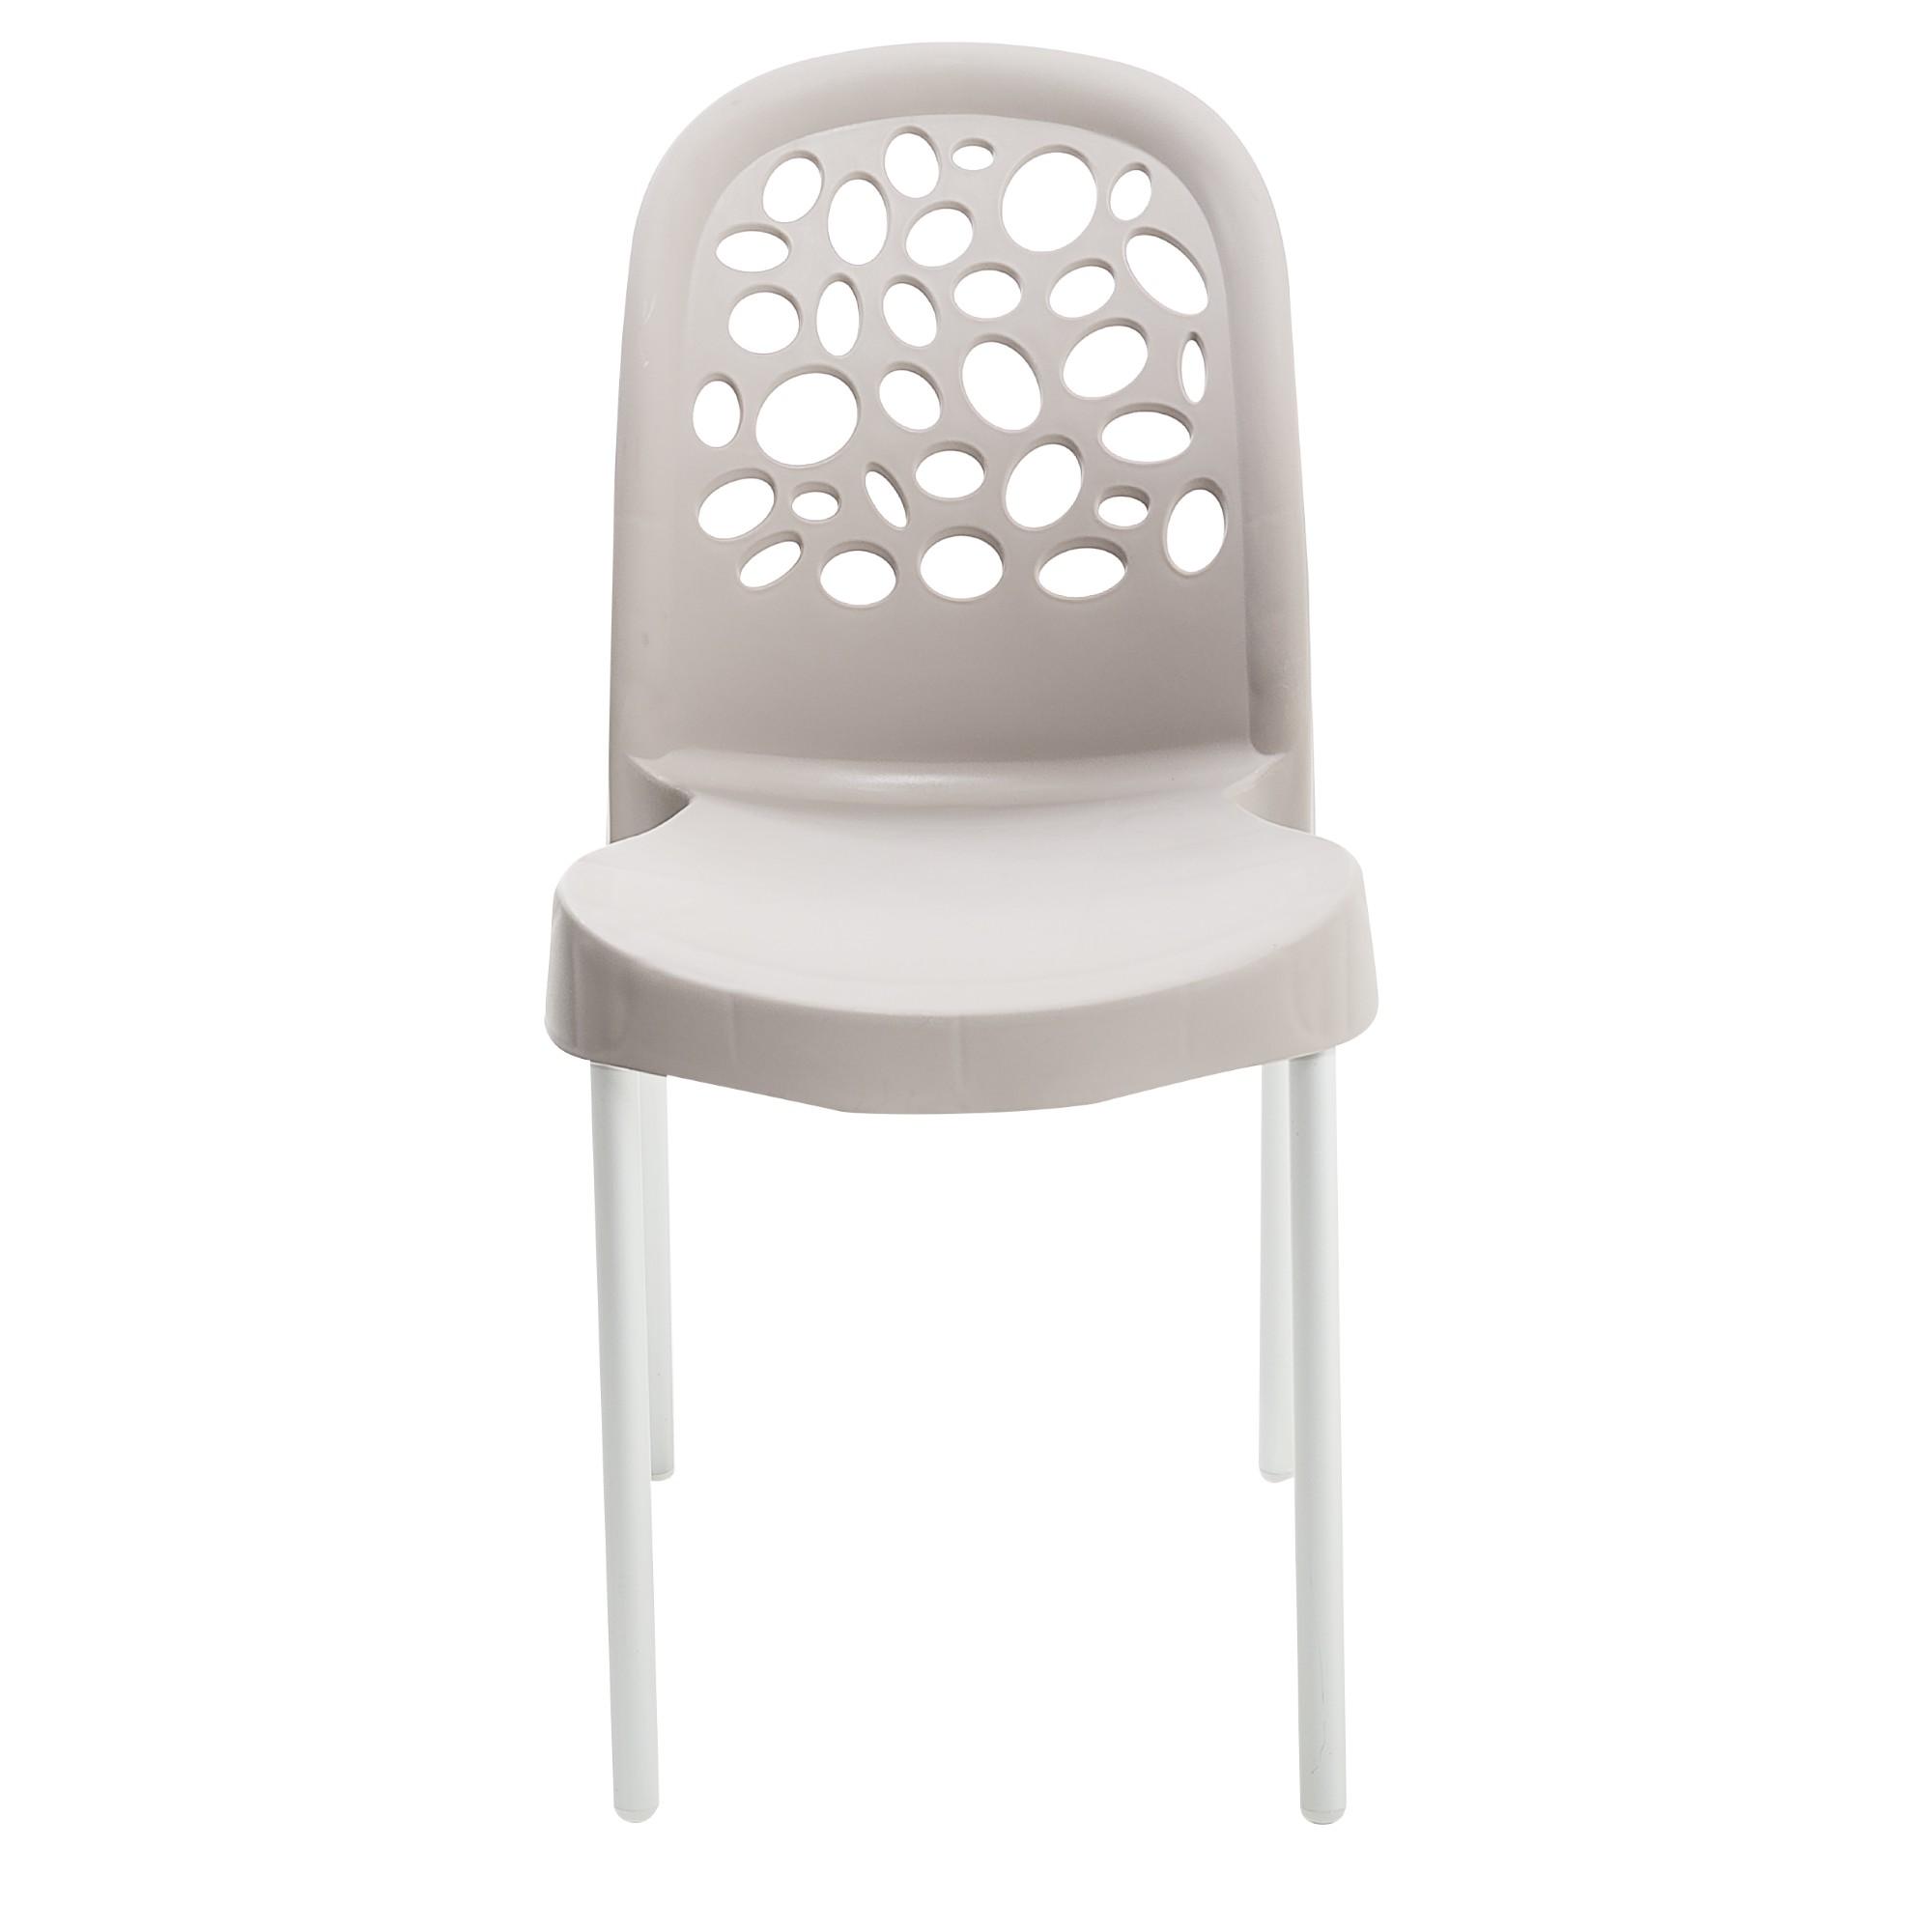 Cadeira Deluxe de Polipropileno Nude - Forte Plastico